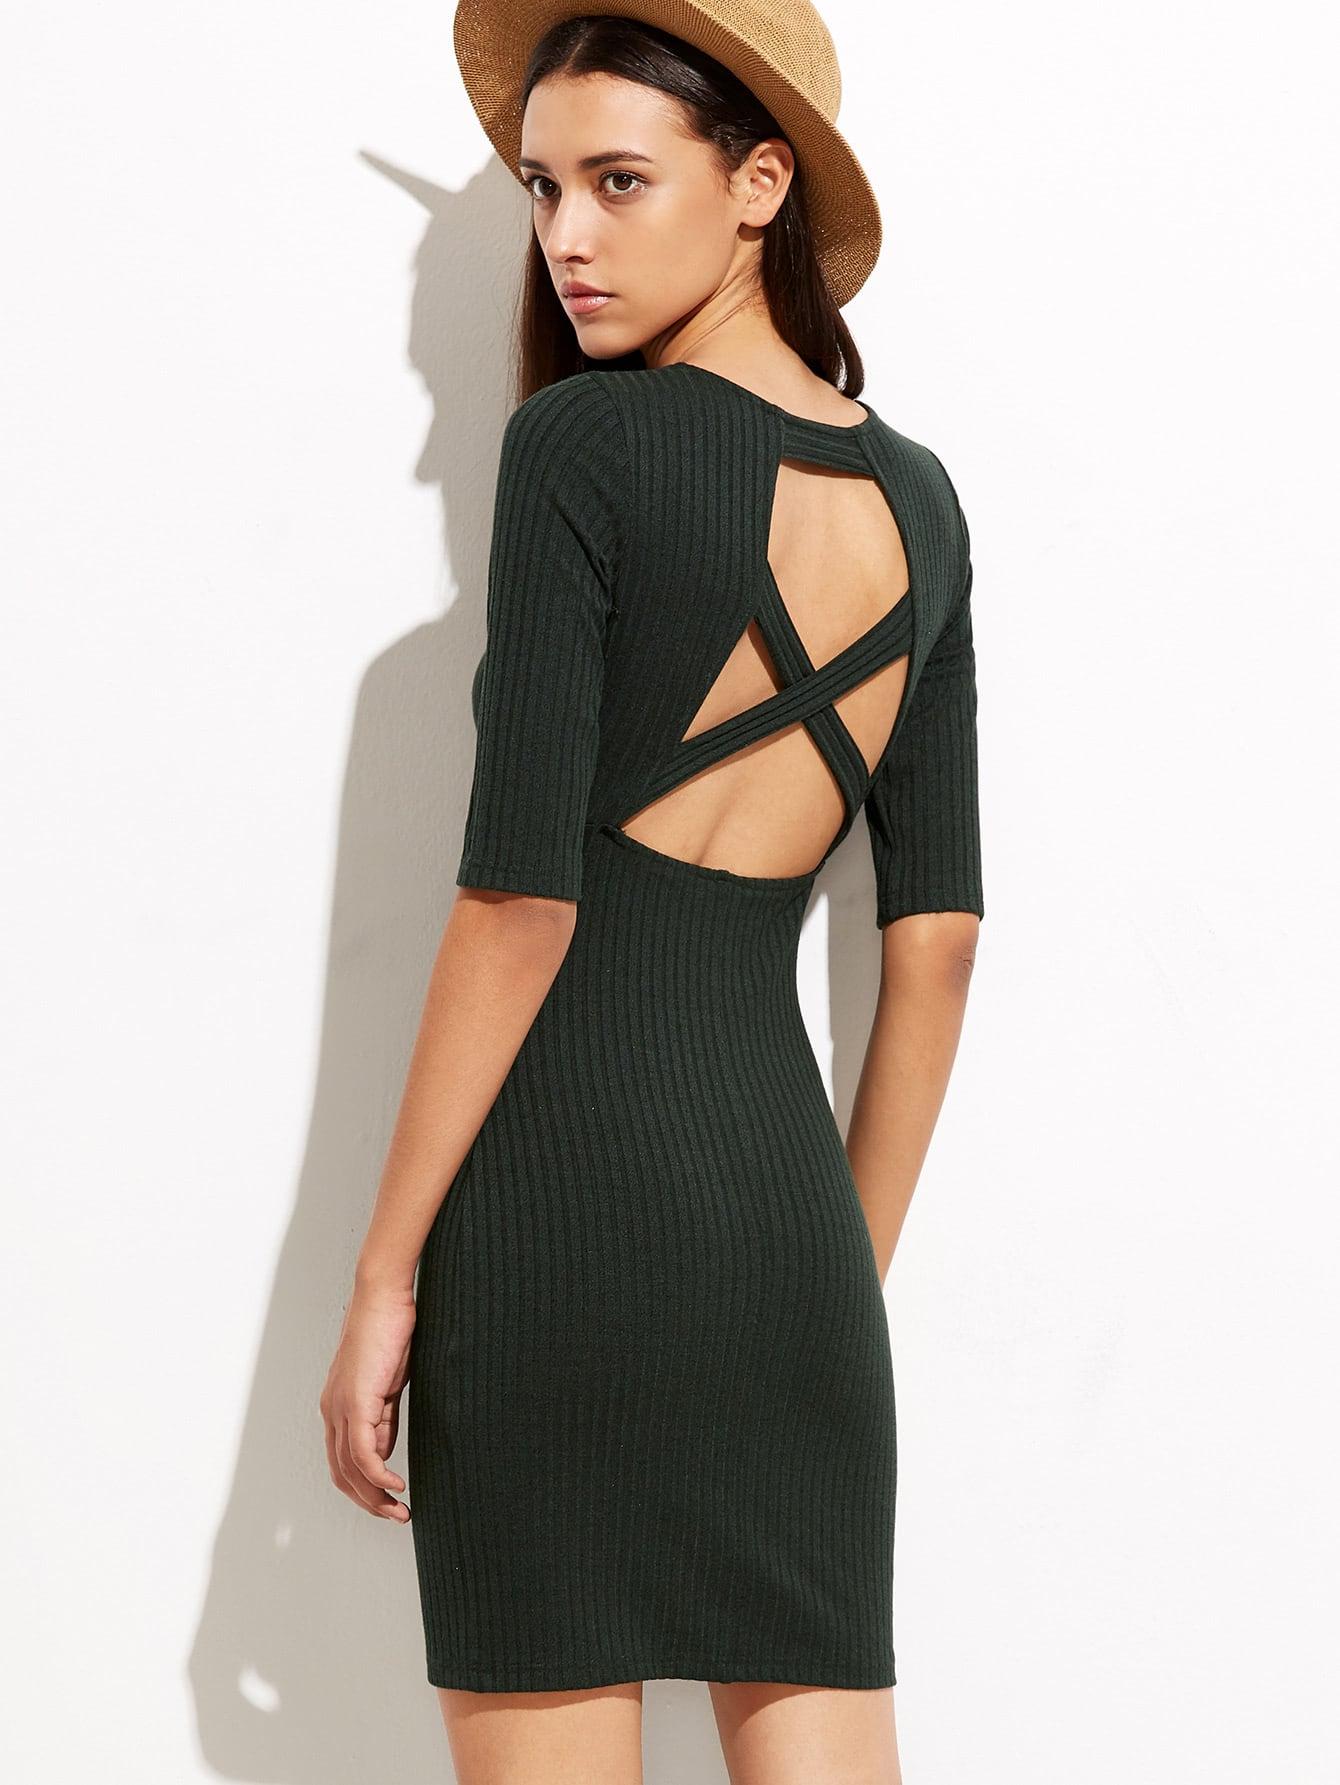 Olive Green Cutout Crisscross Back Ribbed Sheath Dress dress160921704